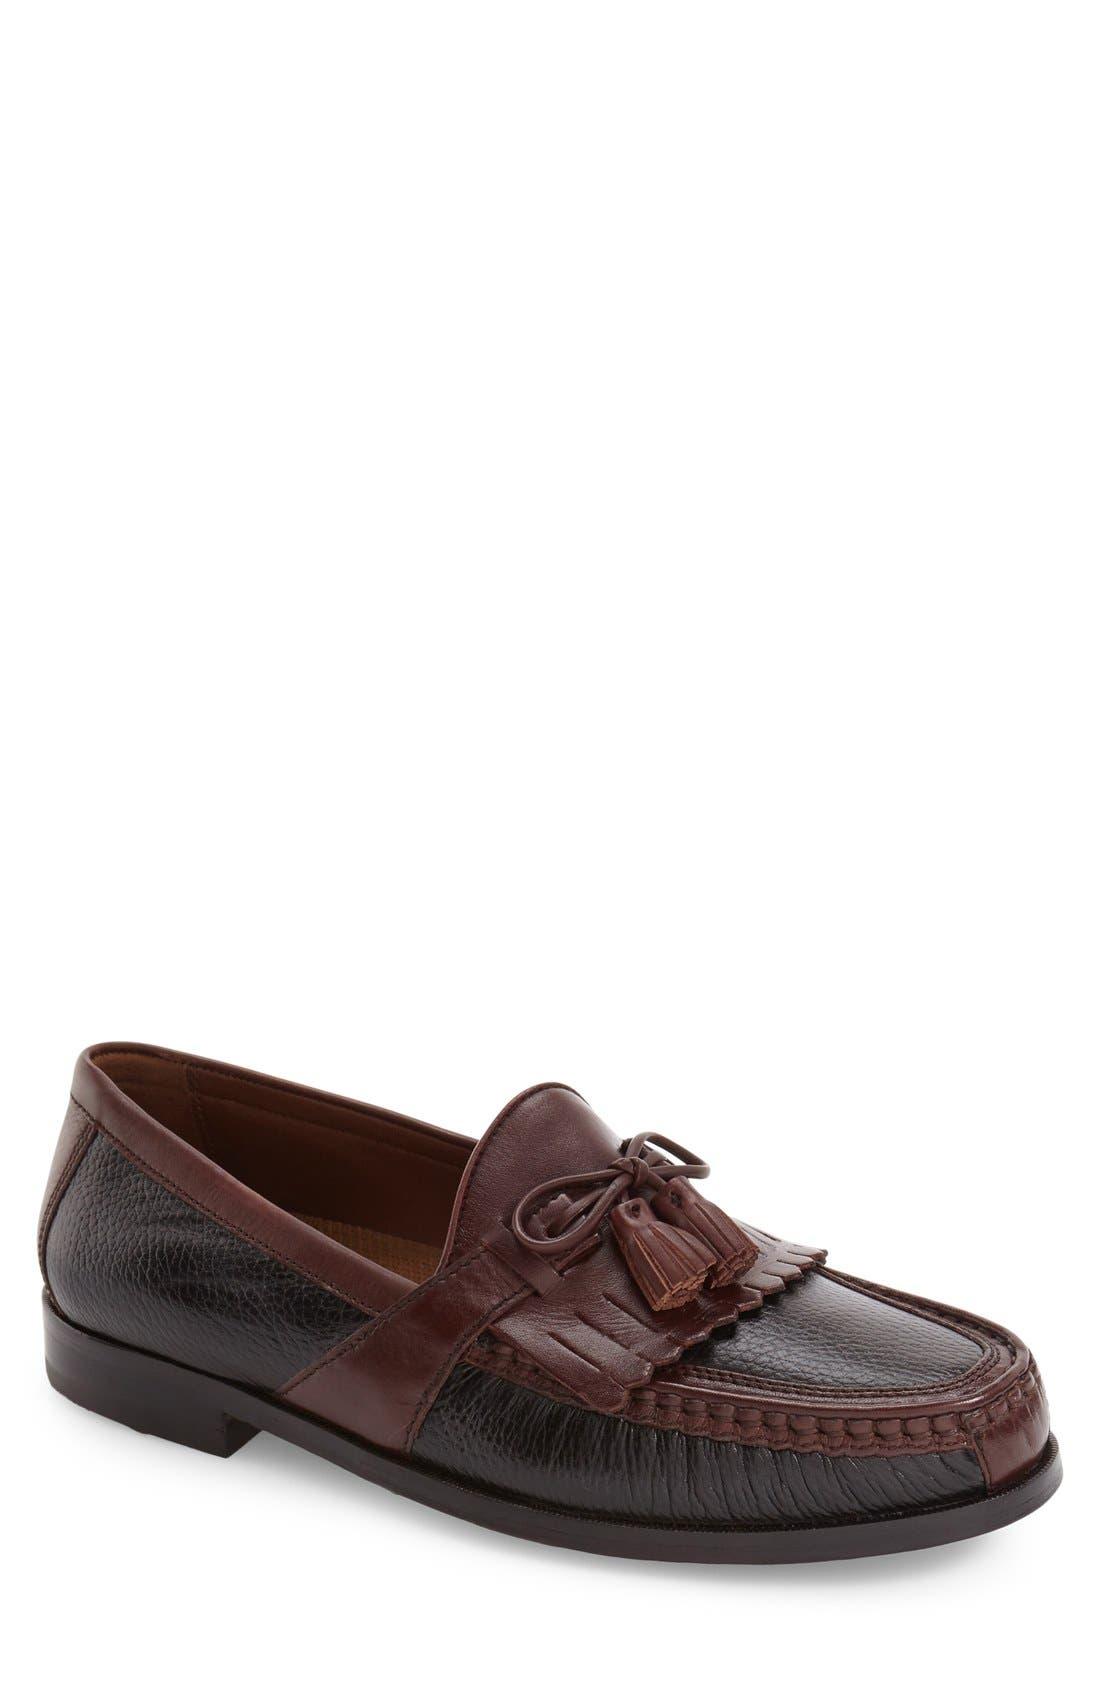 Johnston & Murphy 'Aragon II' Loafer